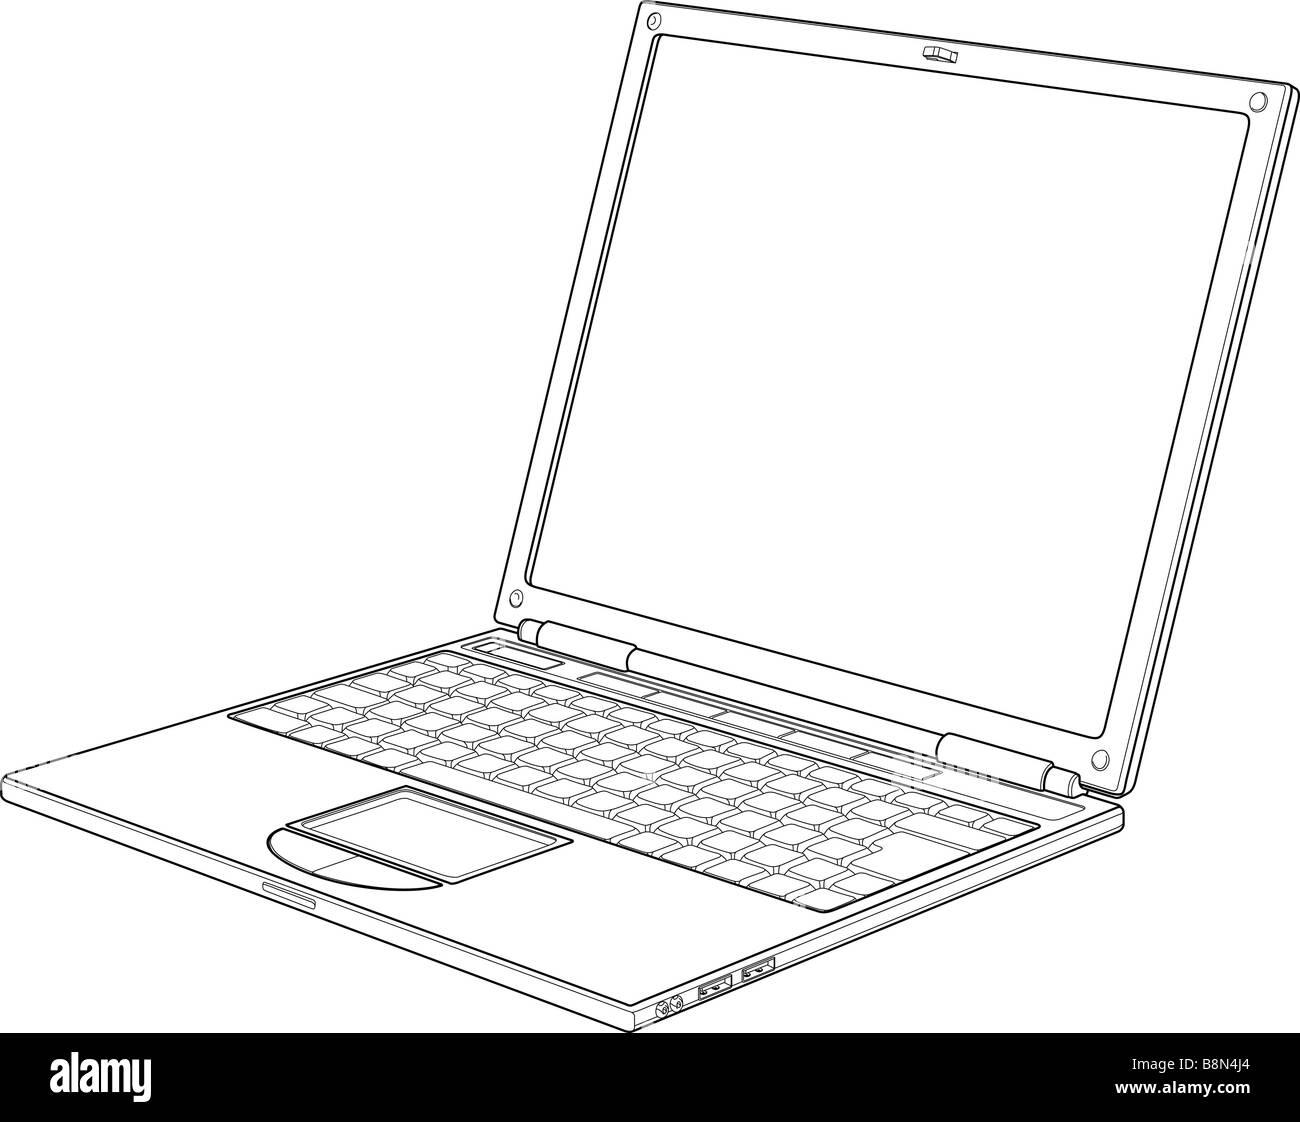 Laptop outline vector illustration - Stock Image